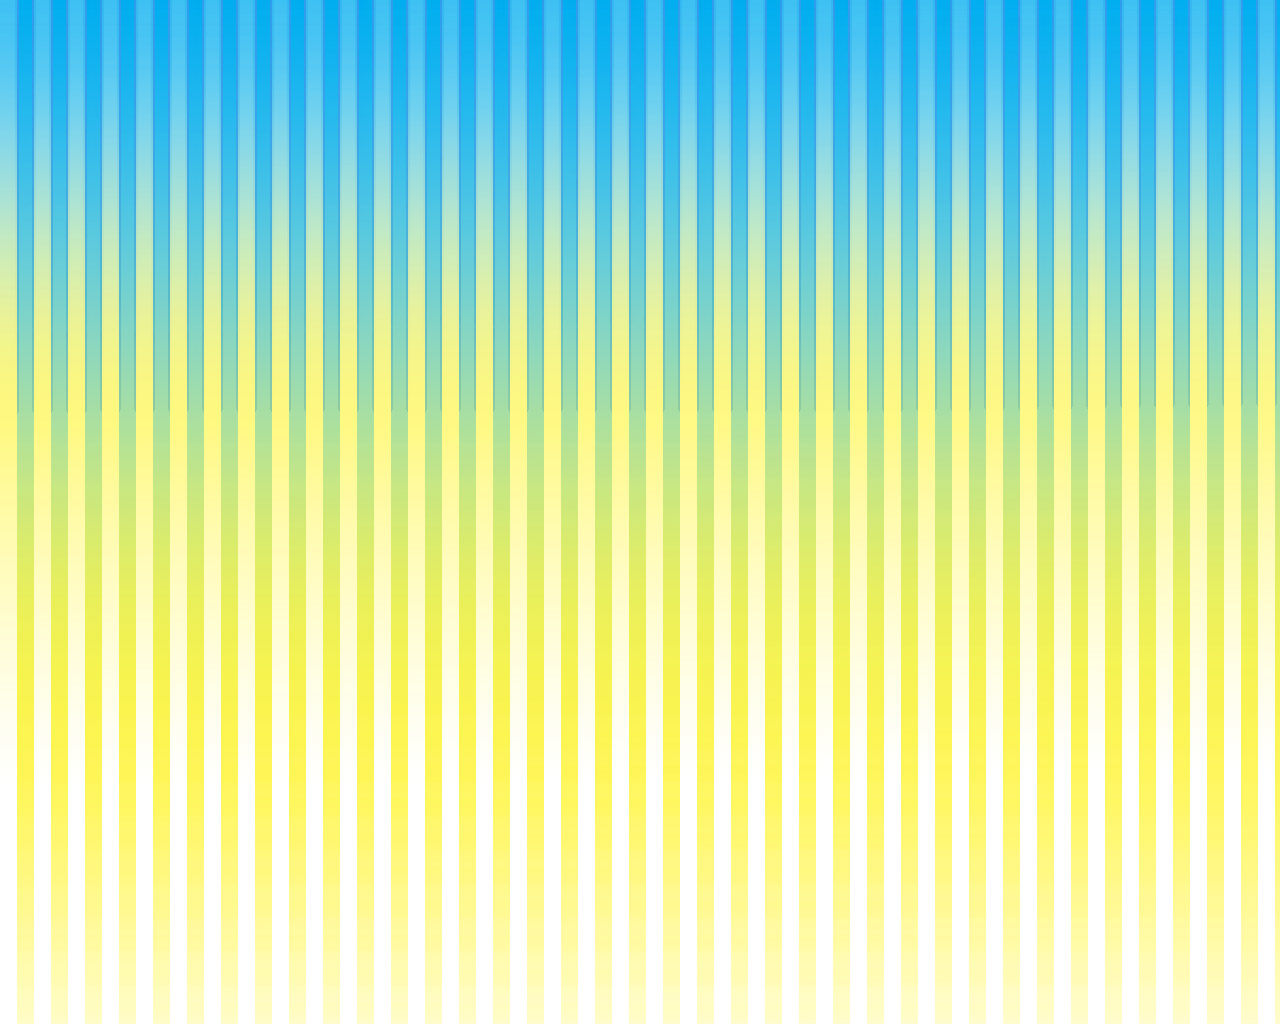 Blue White Yellow Wallpaper - WallpaperSafari